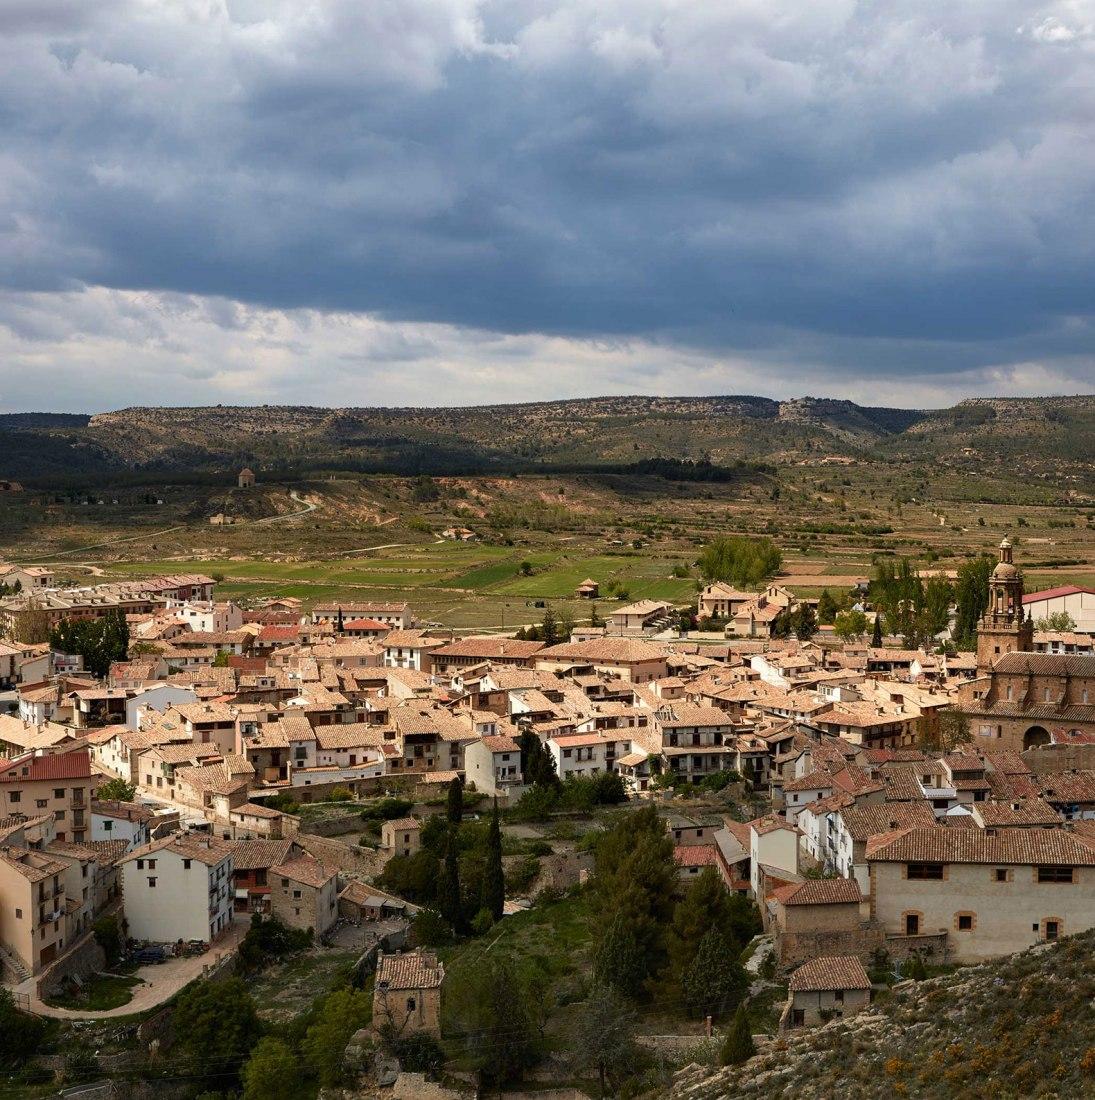 Aerial view. House in Rubielos de Mora, by Ramón Esteve. Photograph by Mariela Apollonio